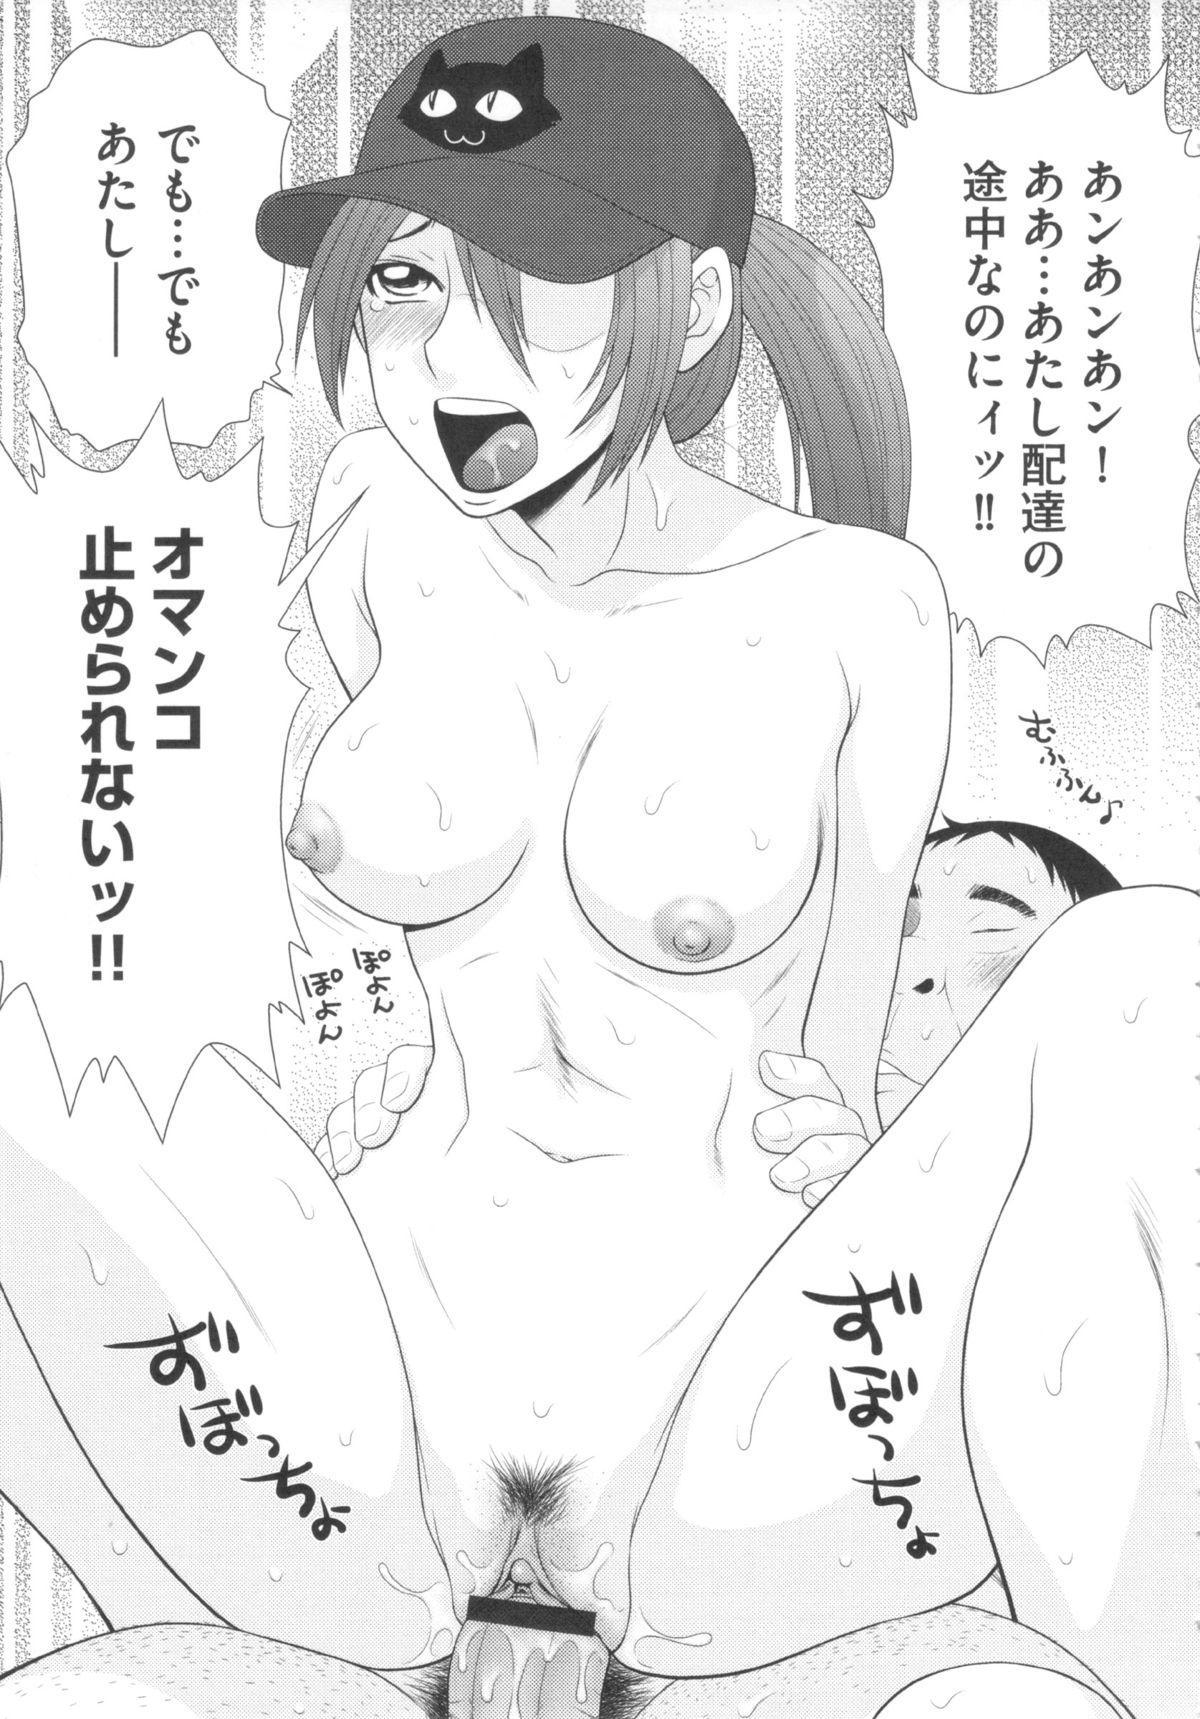 Kiseki No Zaajiru - Sperm of Miracle 65